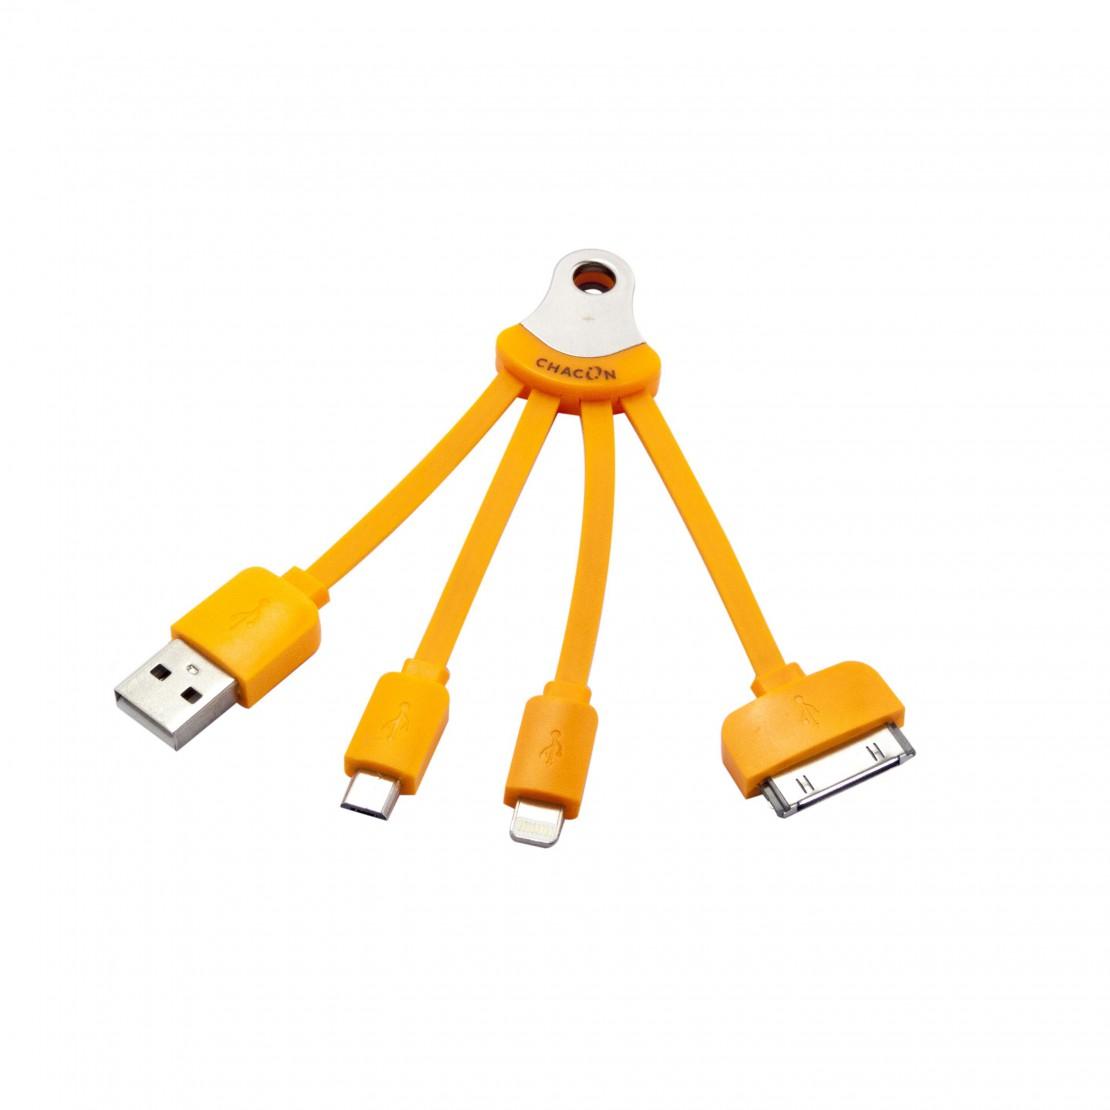 Câble chargeur iphone 5, micro , iphone 4